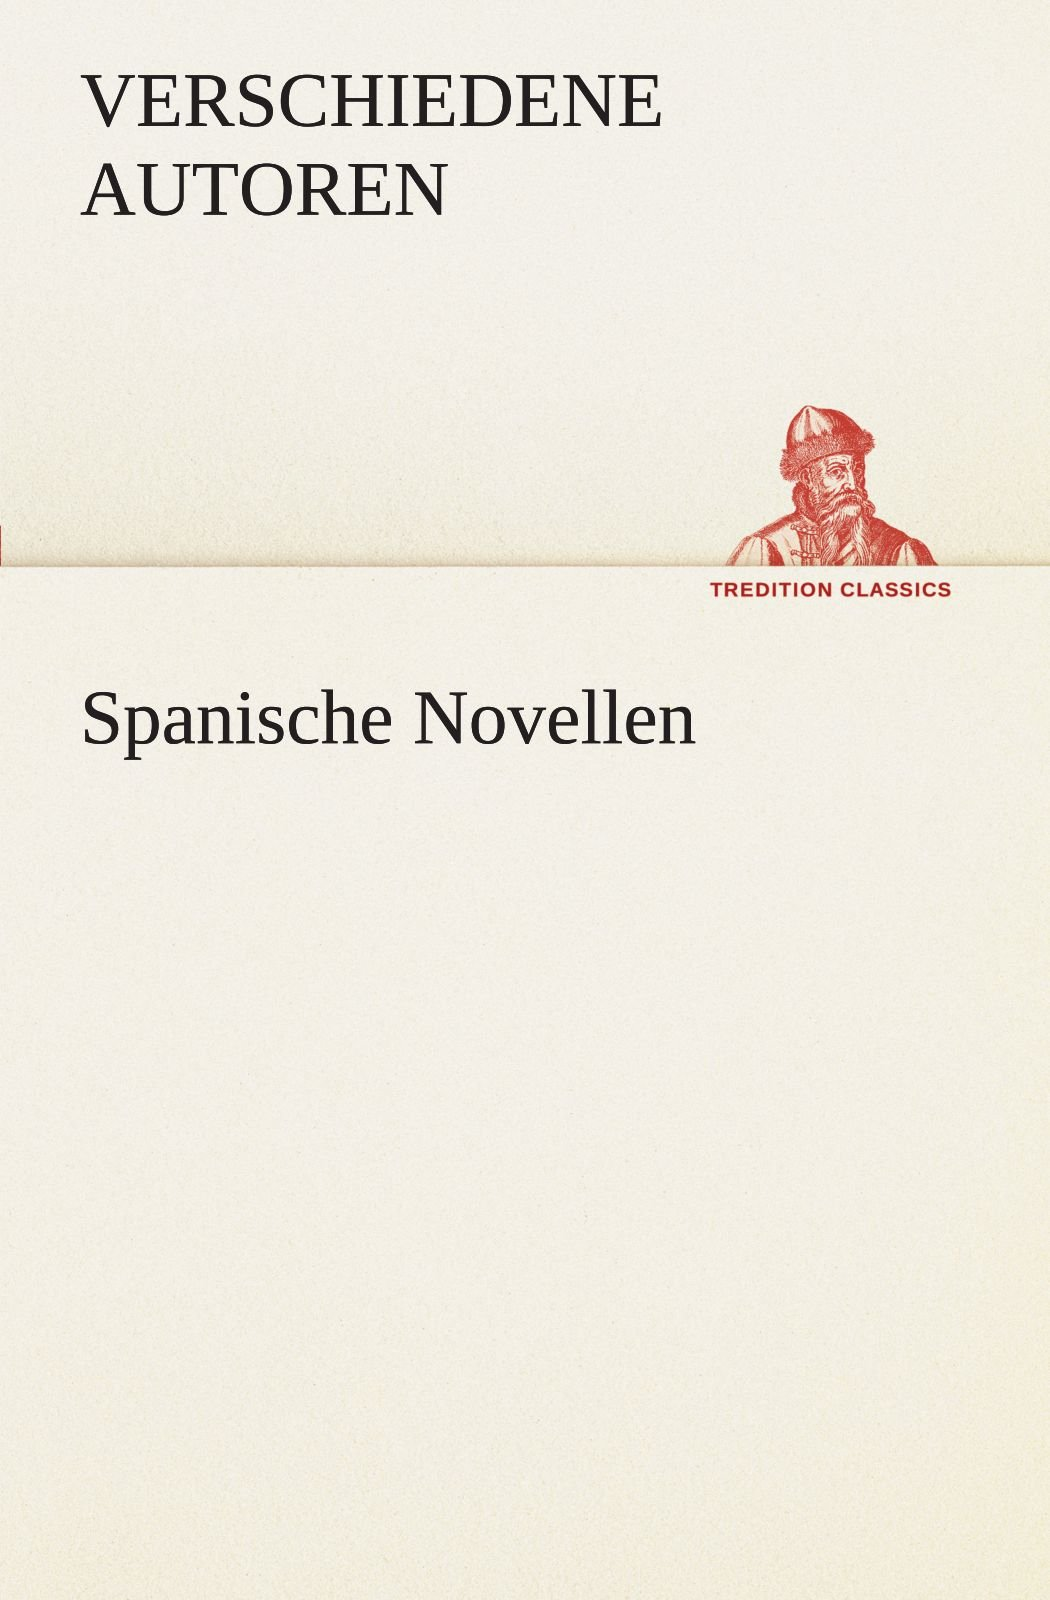 Download Spanische Novellen (TREDITION CLASSICS) (German Edition) pdf